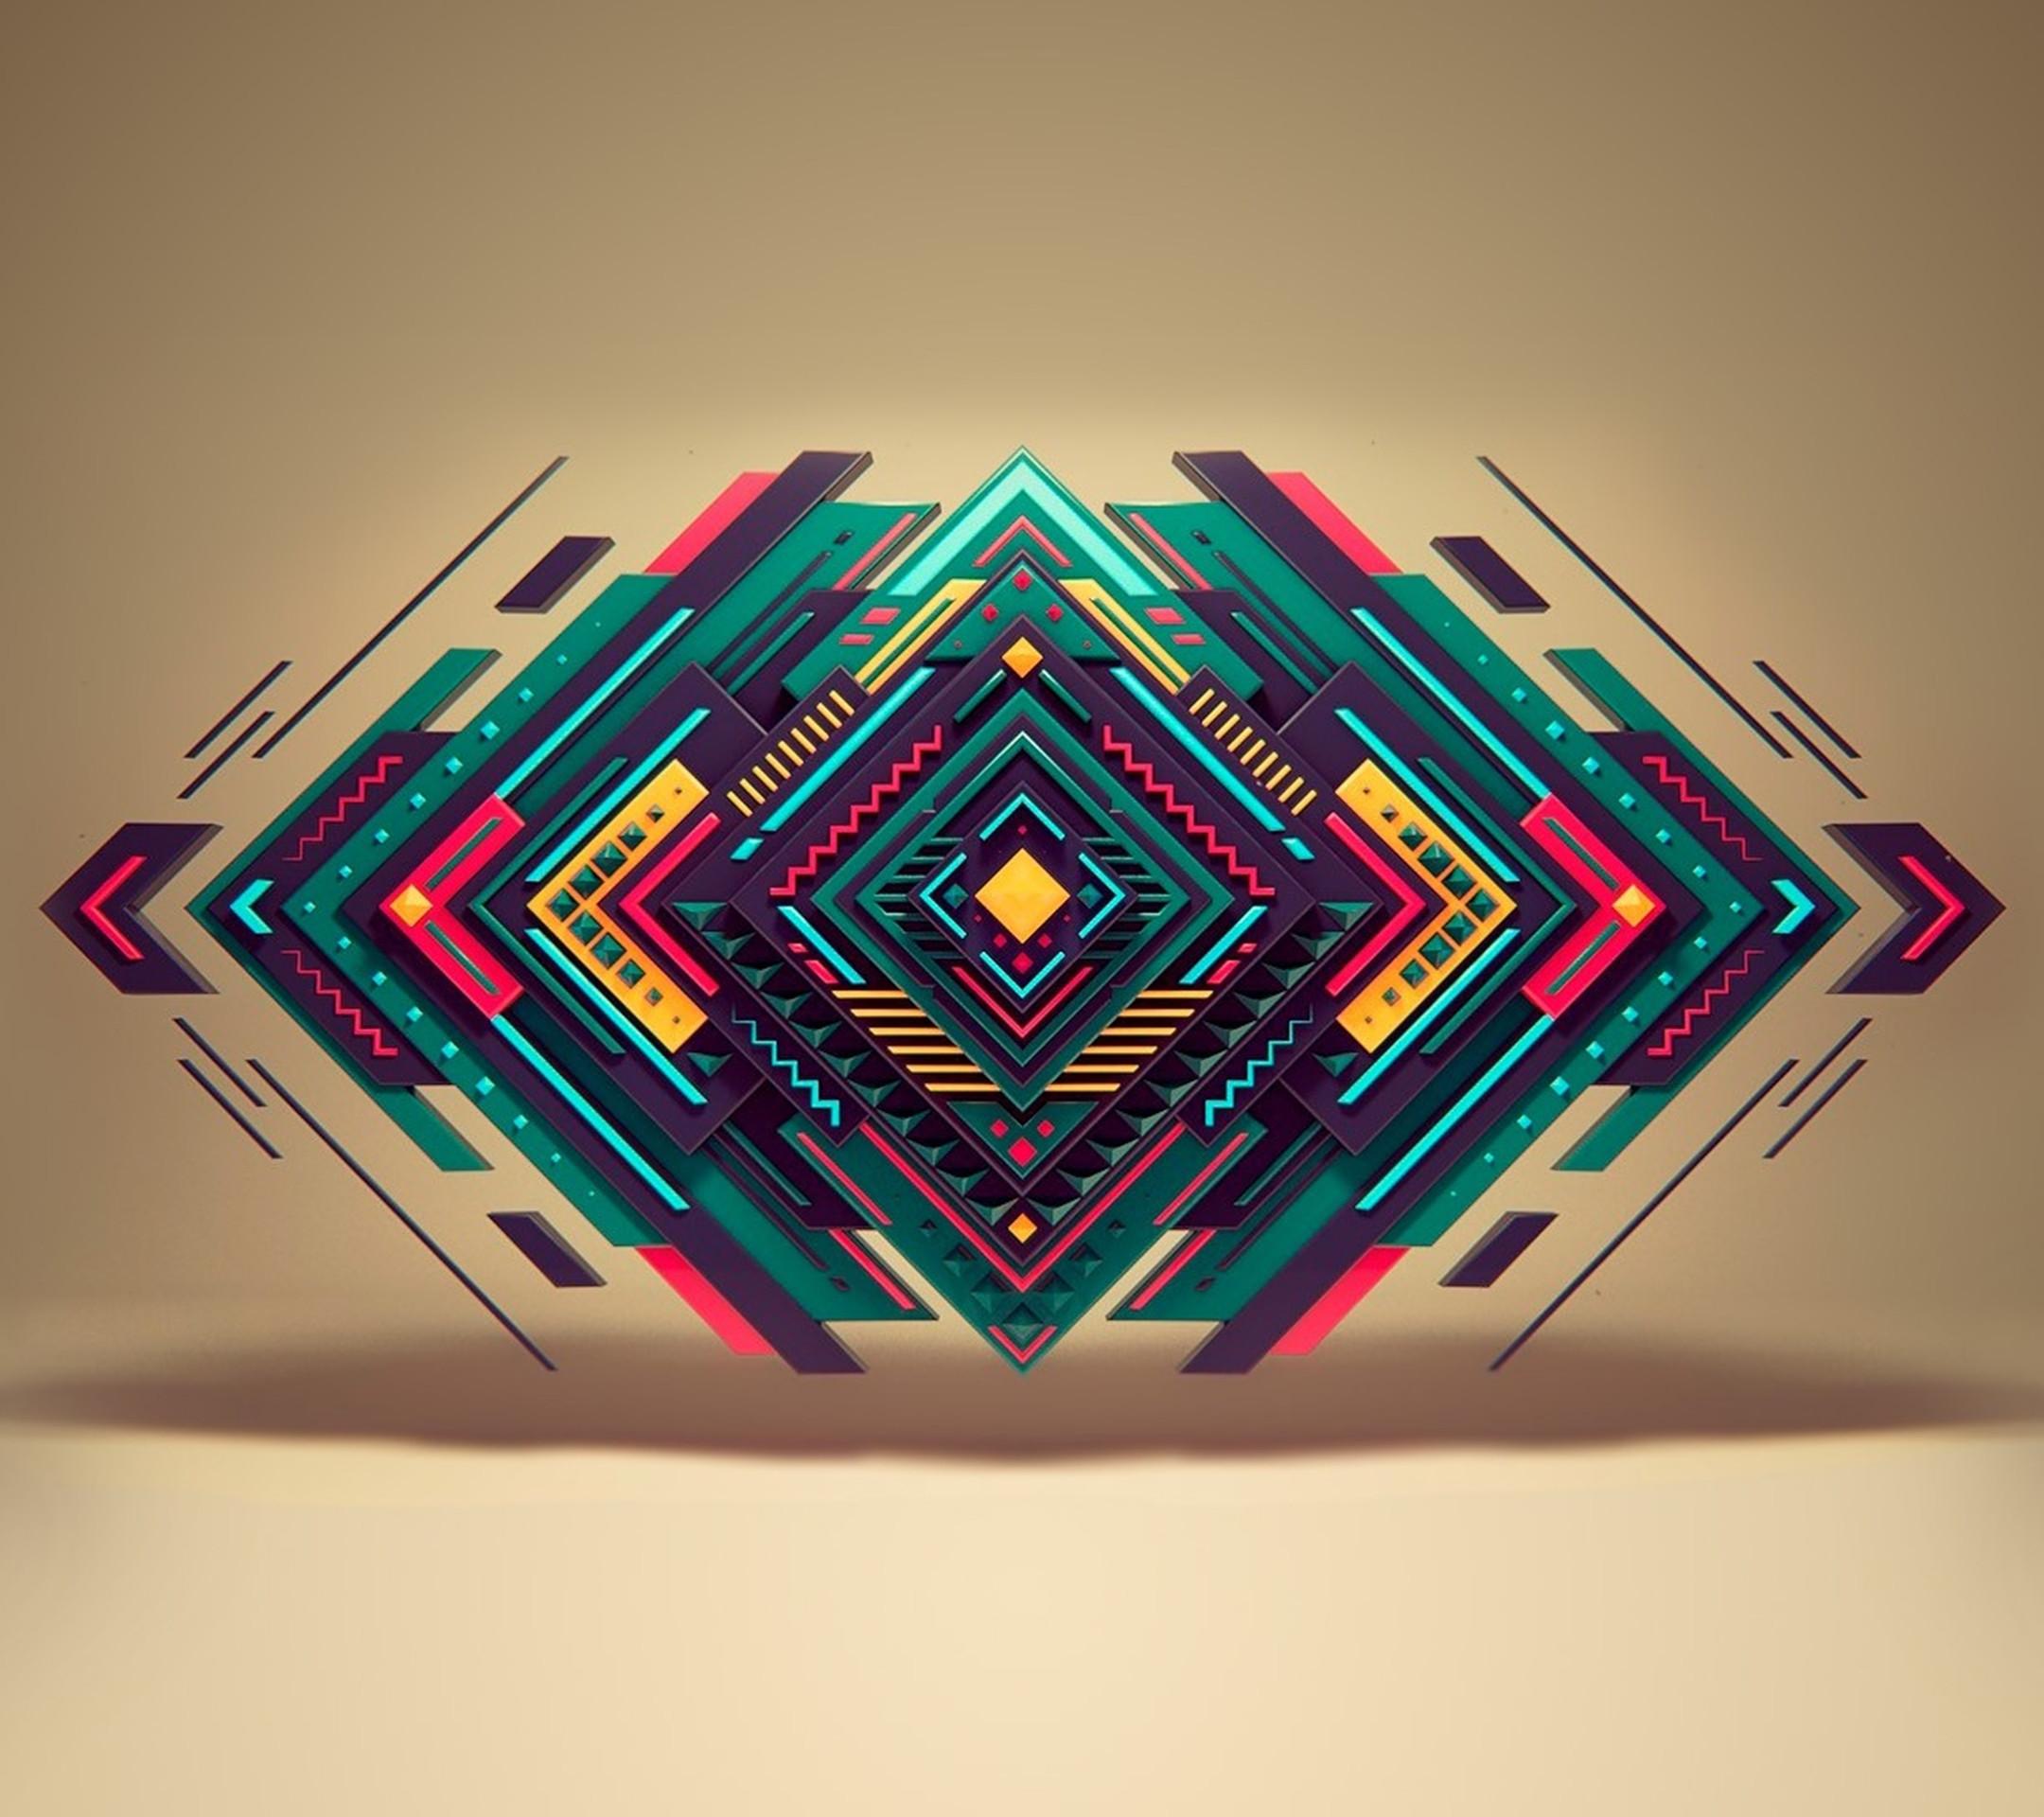 Geometry-HD-Samsung-Galaxy-S5-Wallpapers.jpg (2160×